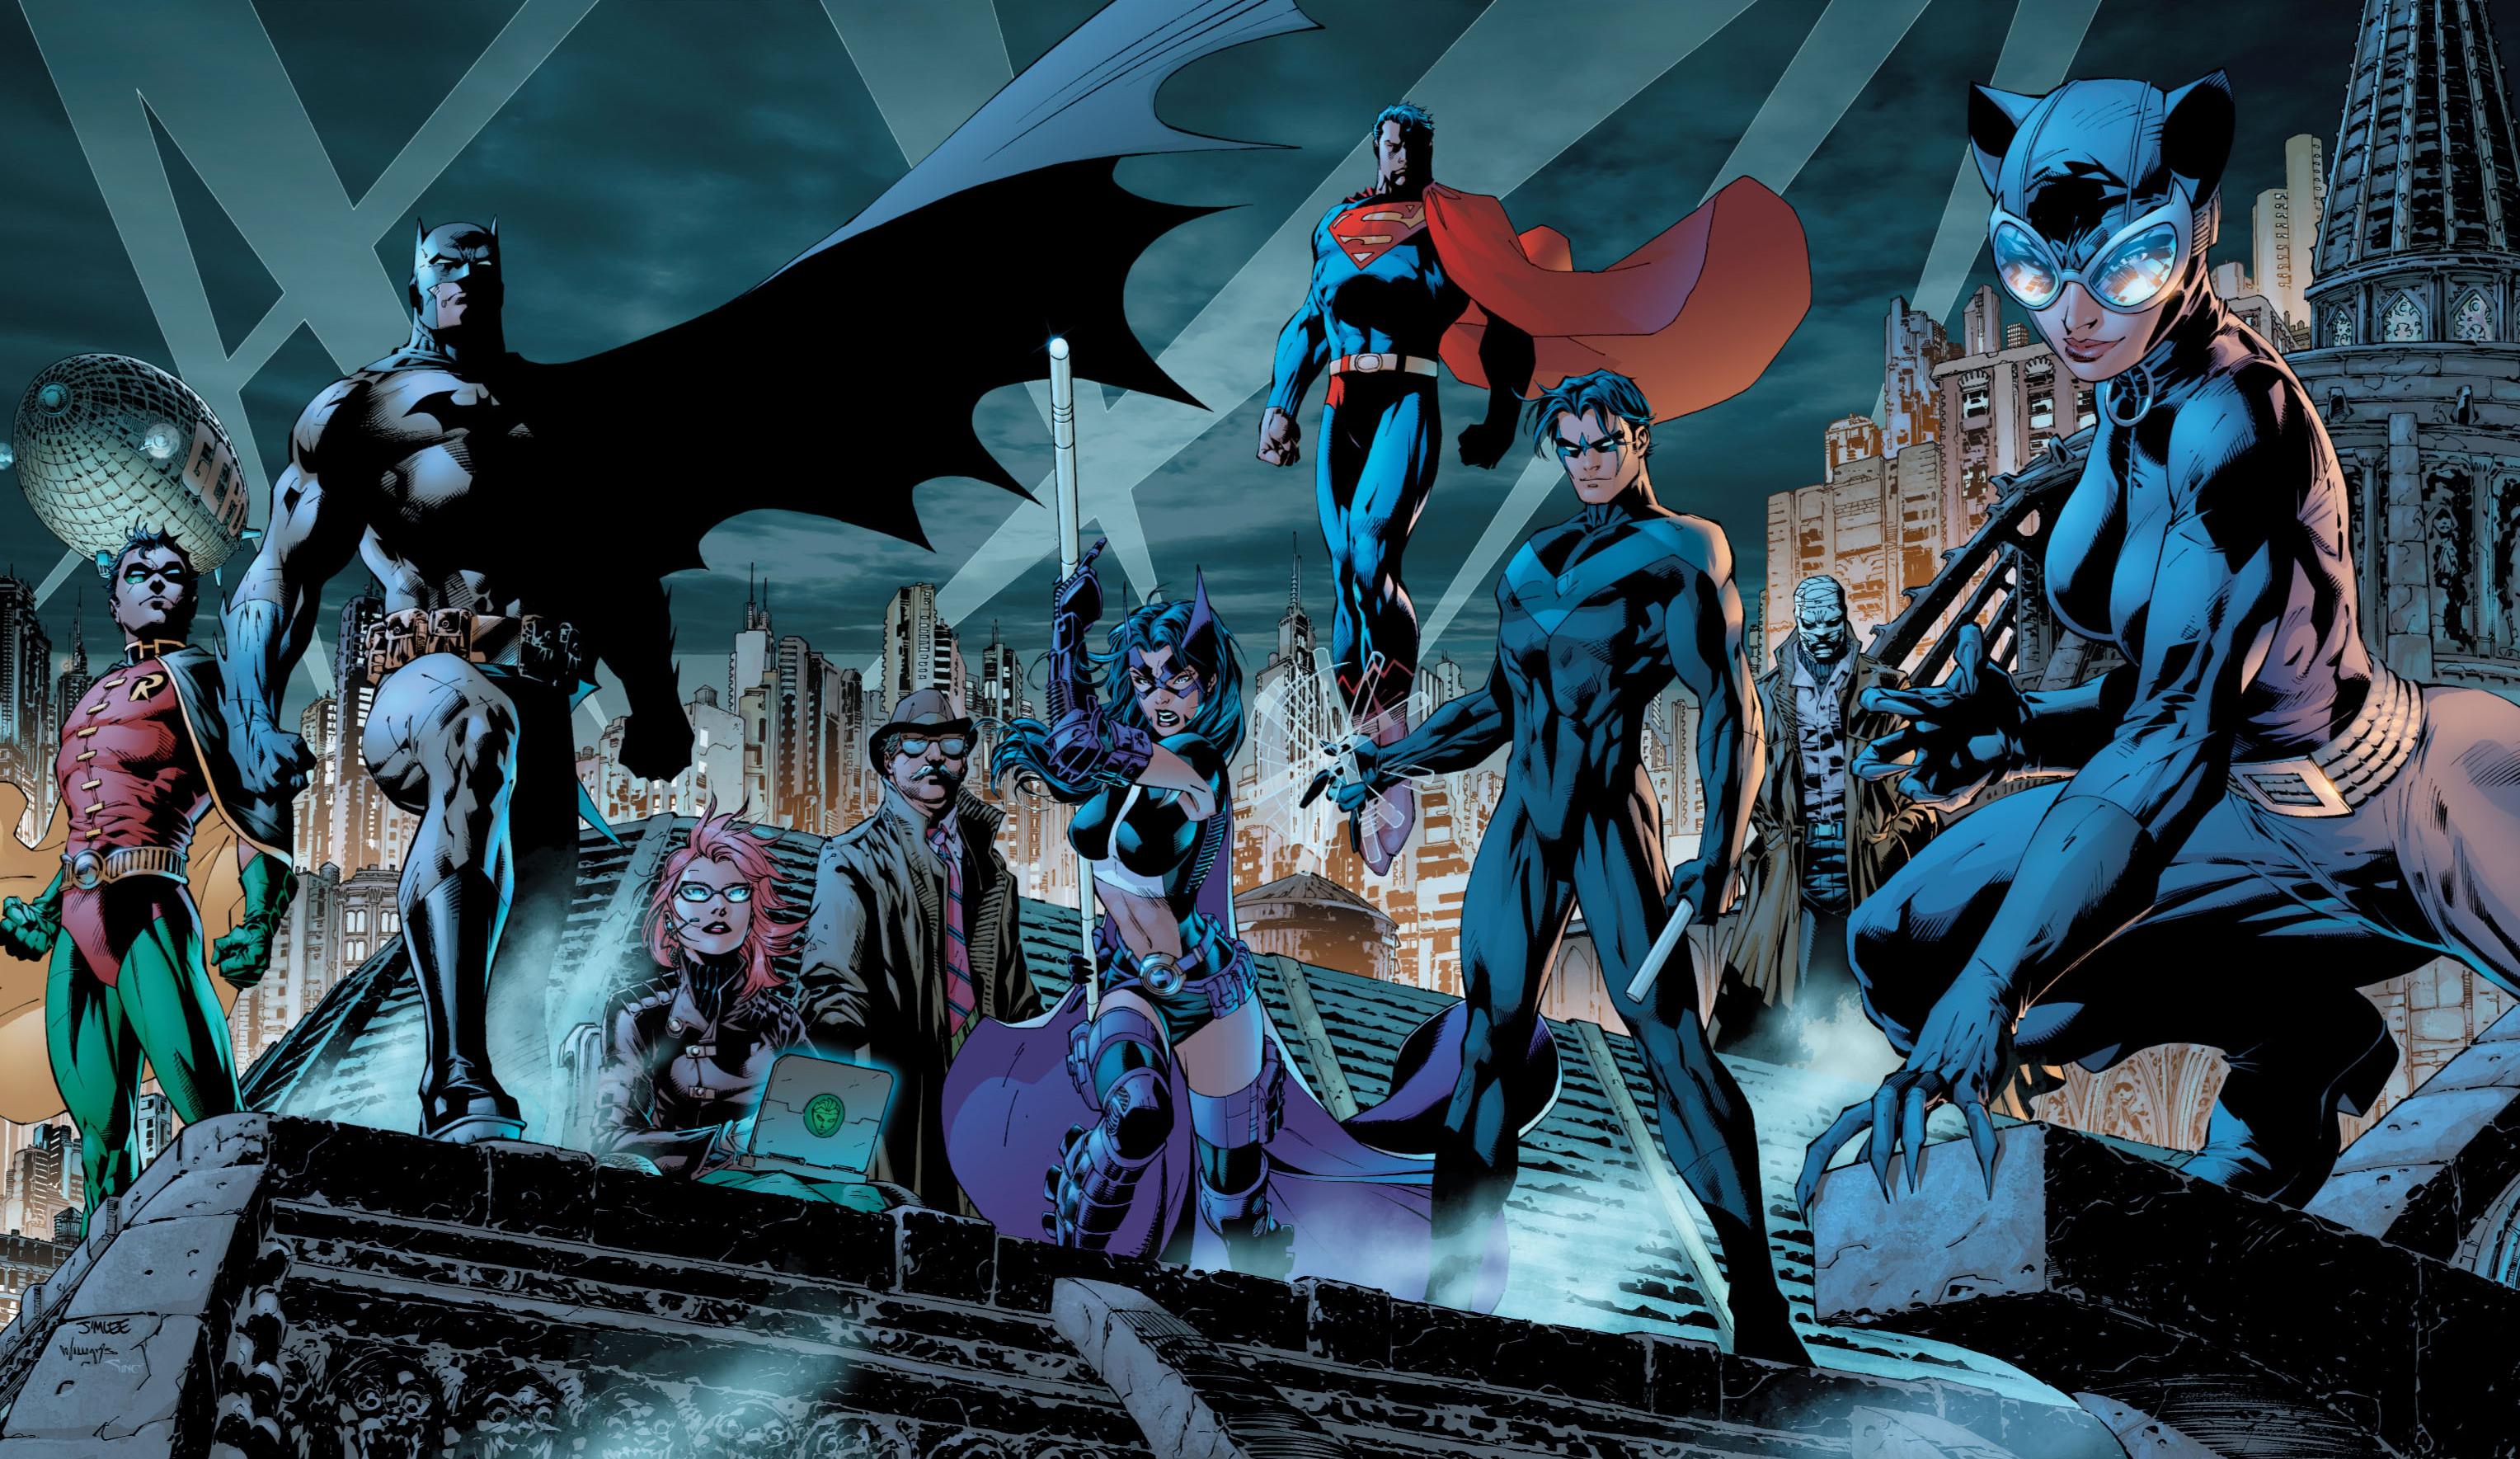 JLA: la Liga de la Justicia en cine - Página 2 Batman_Family_0004